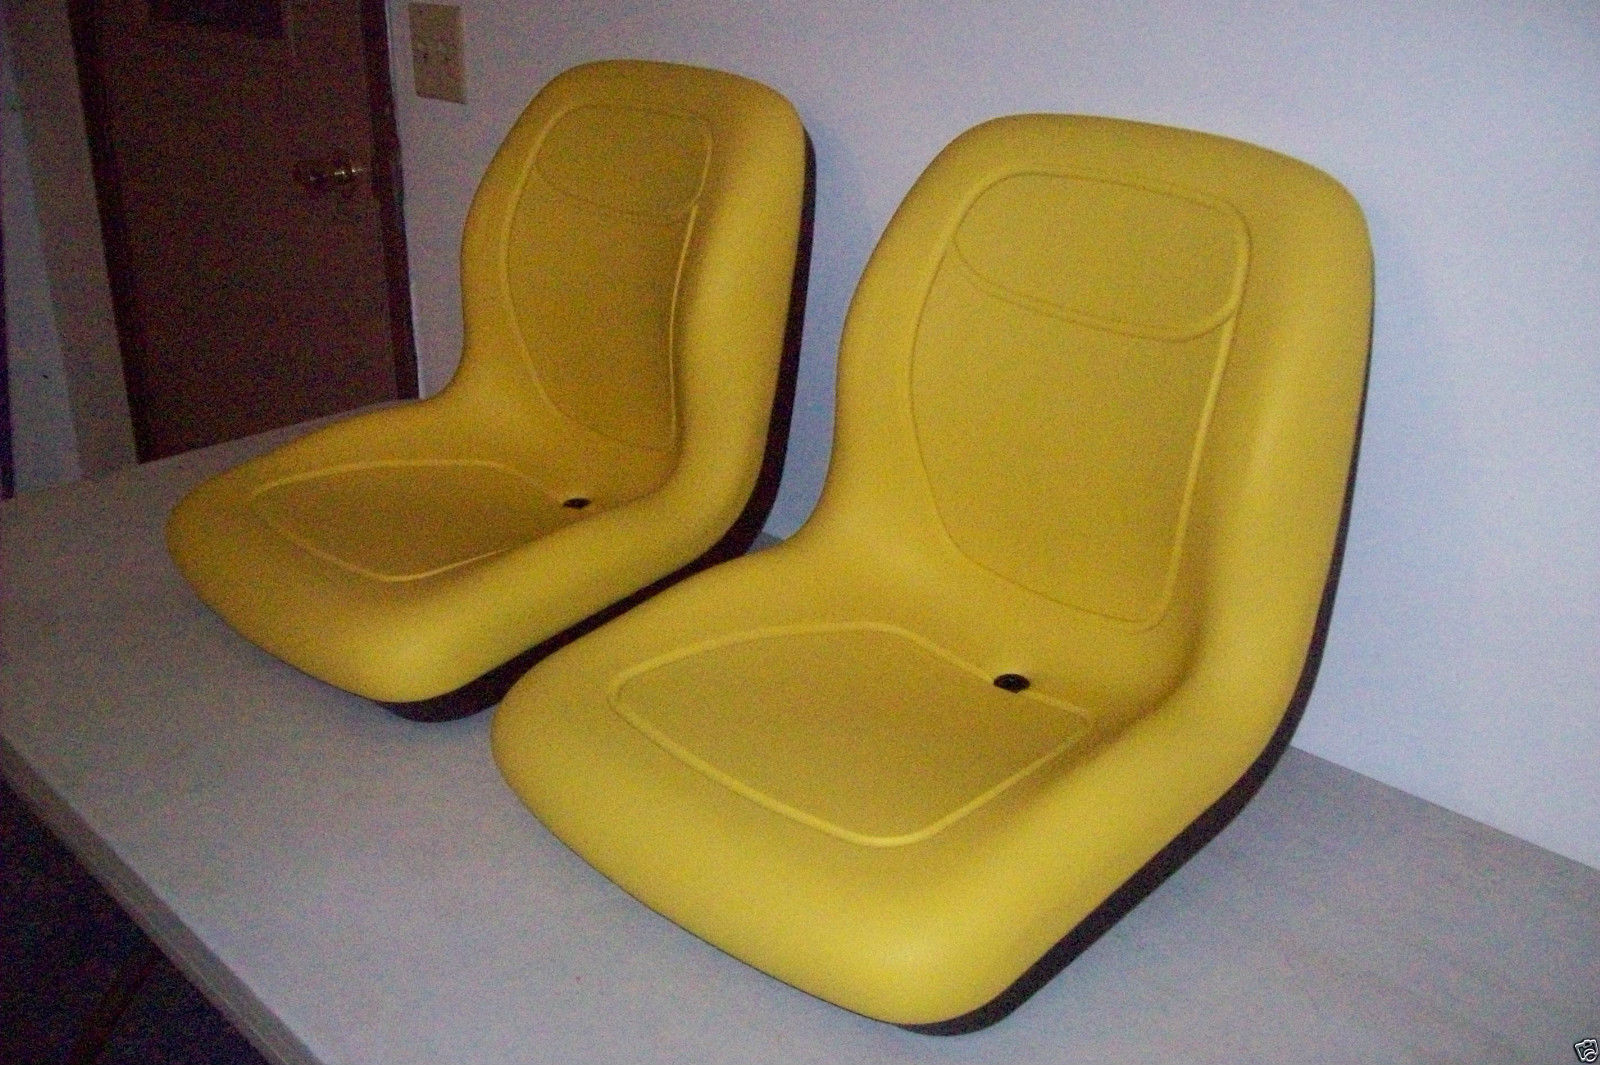 Two 4X2 6X4 Gator Seats John Deere